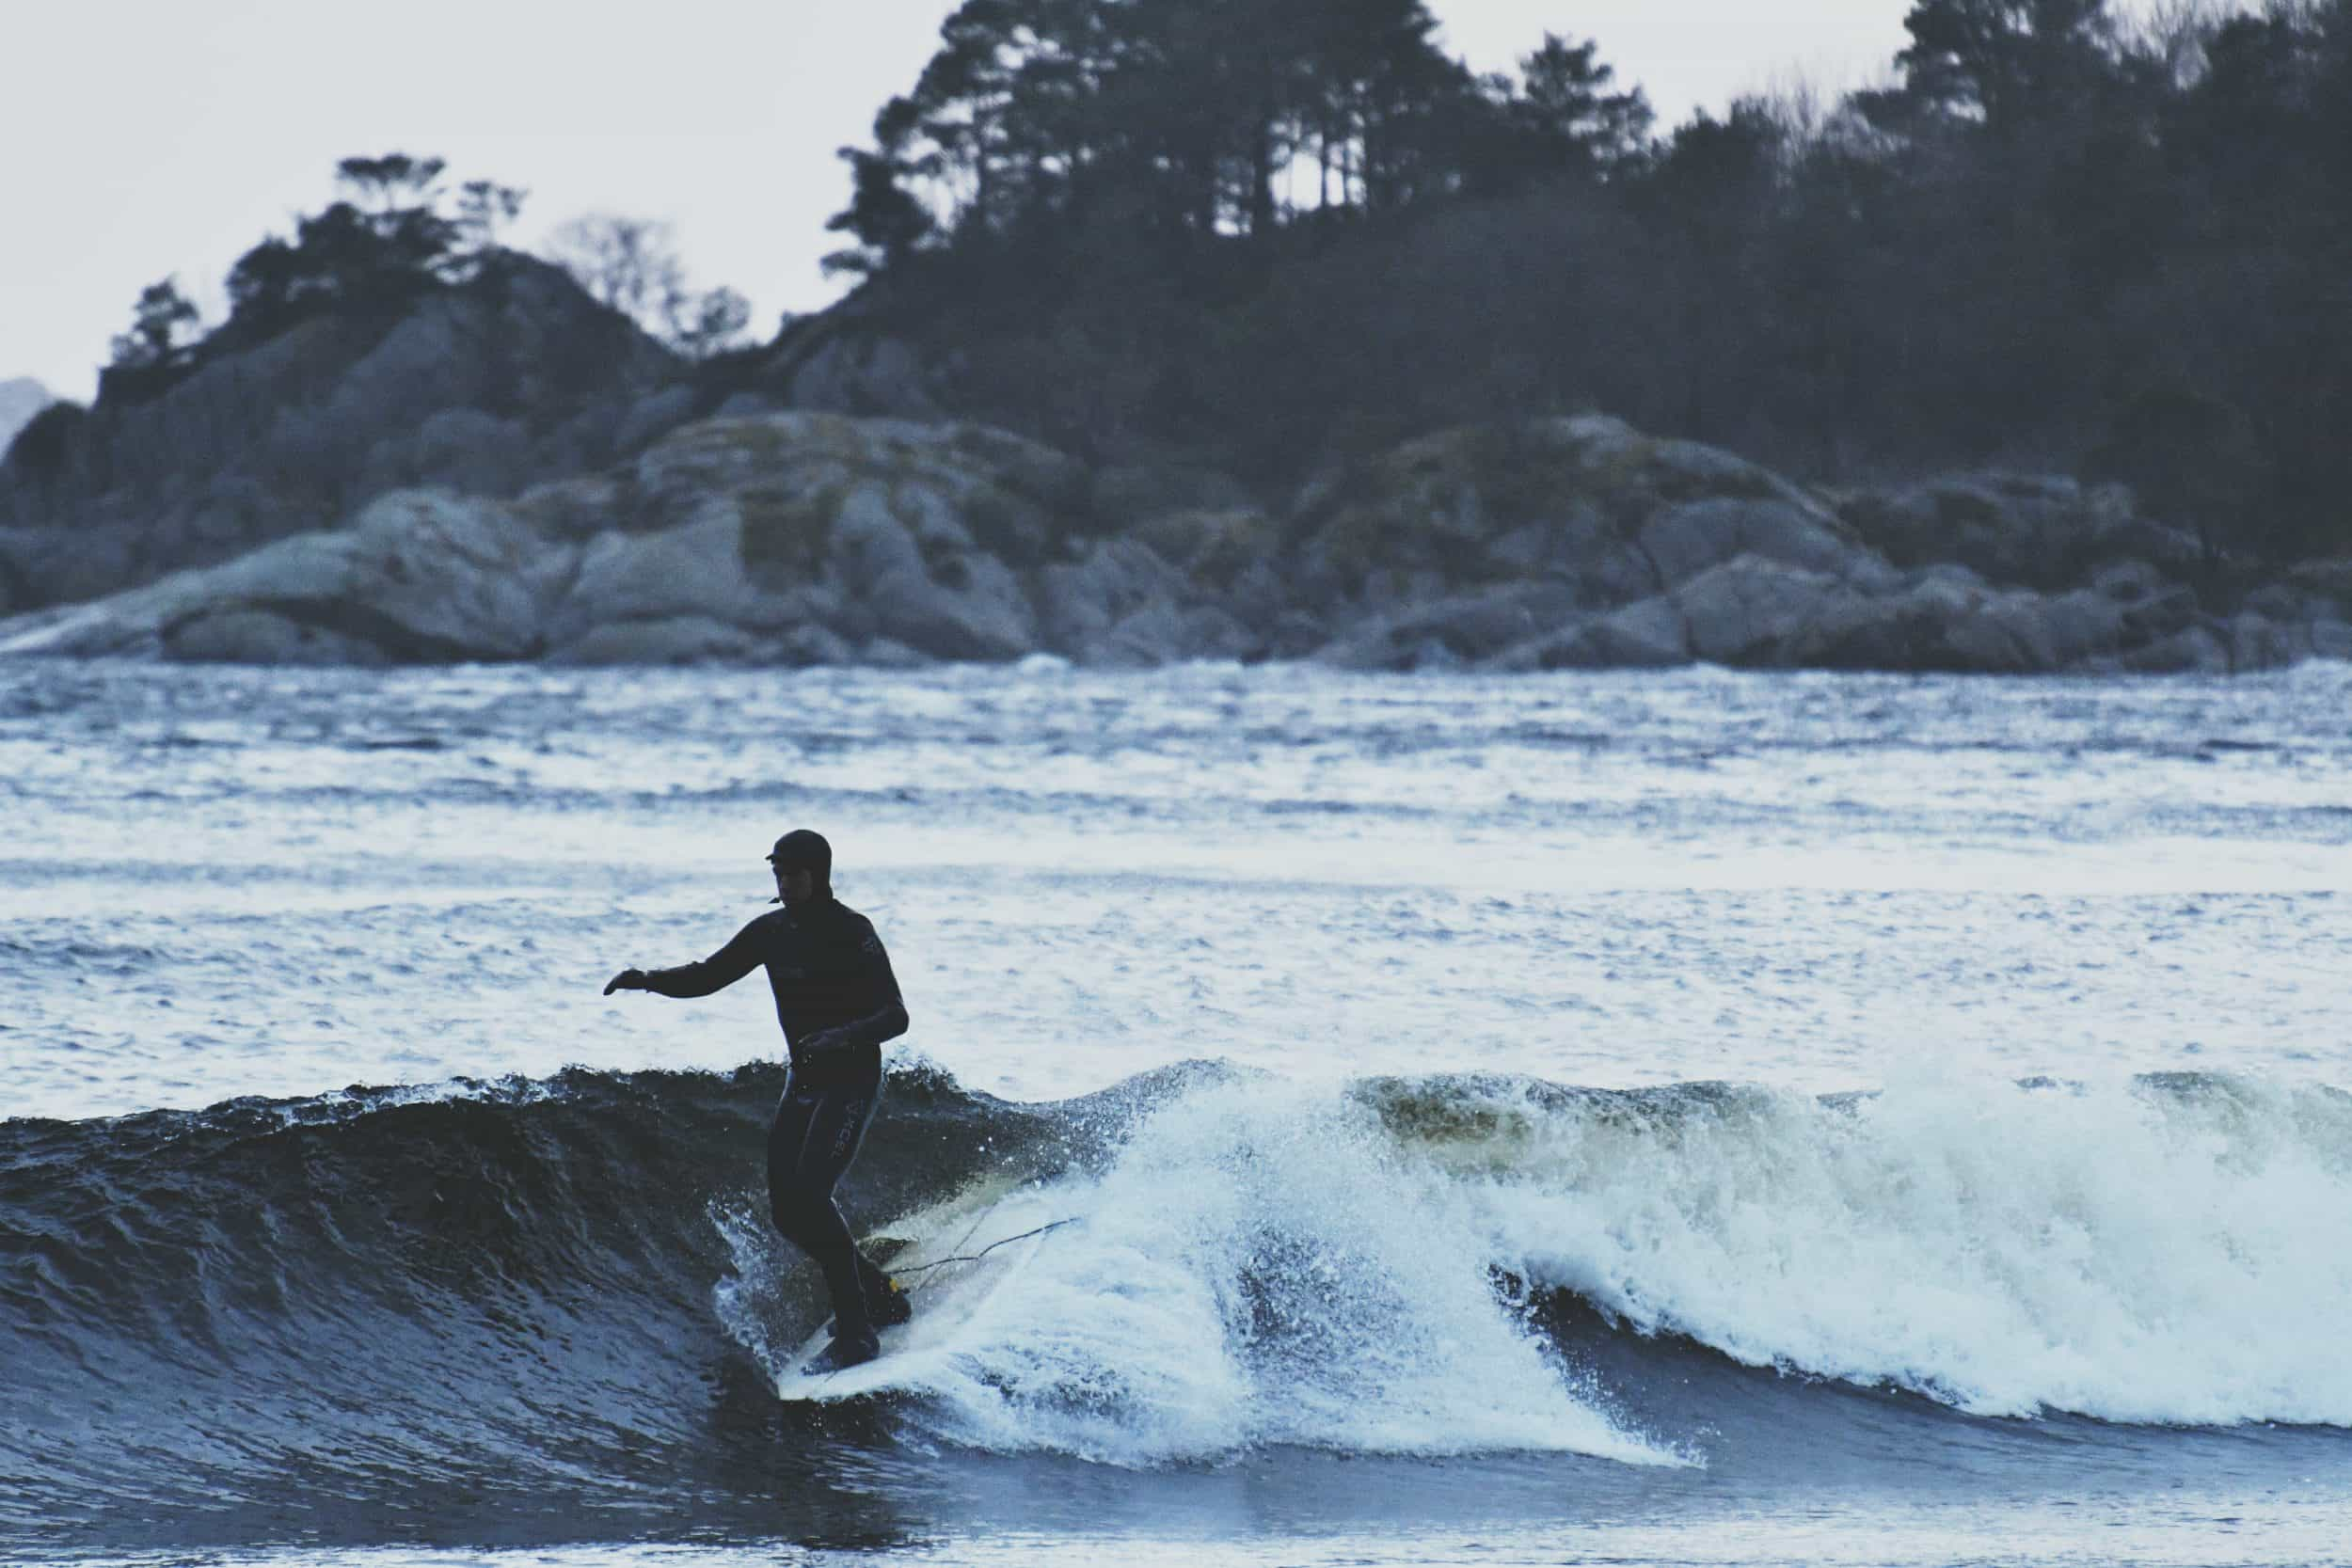 David Vanegan - Sjøsanden Mandal 22.02.17 matta_pe surfer